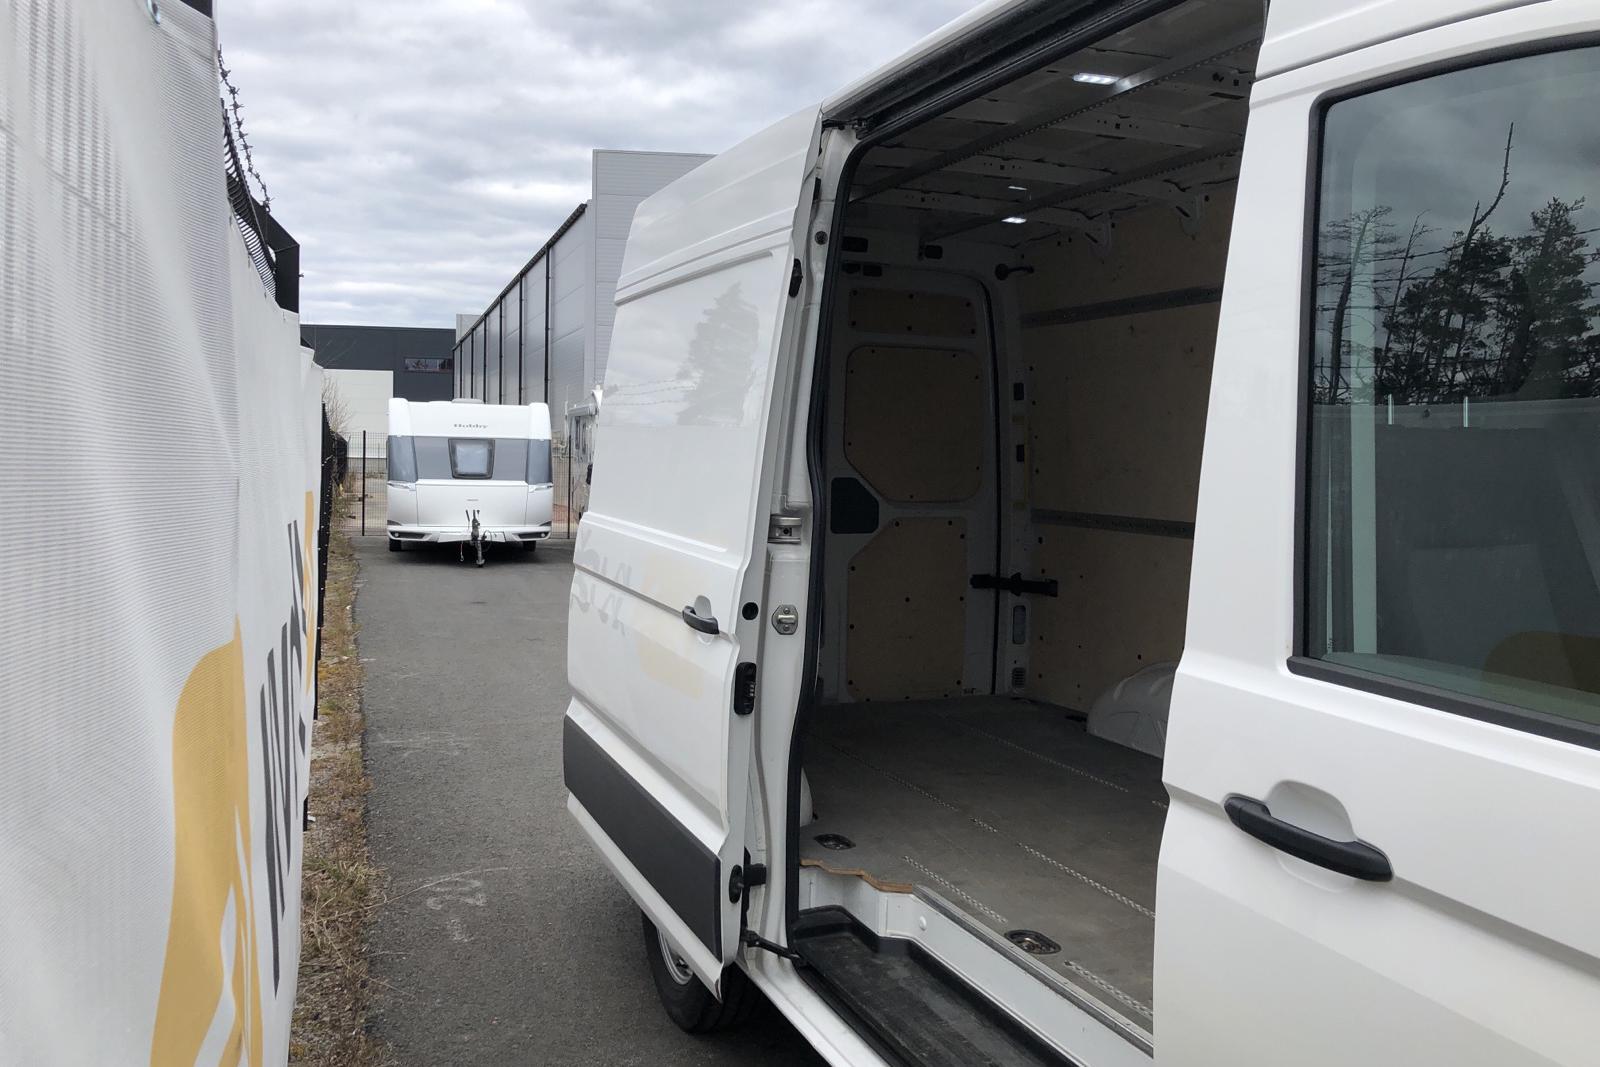 VW Crafter 35 2.0 TDI Skåp 4Motion (177hk) - 19 288 mil - Manuell - vit - 2018